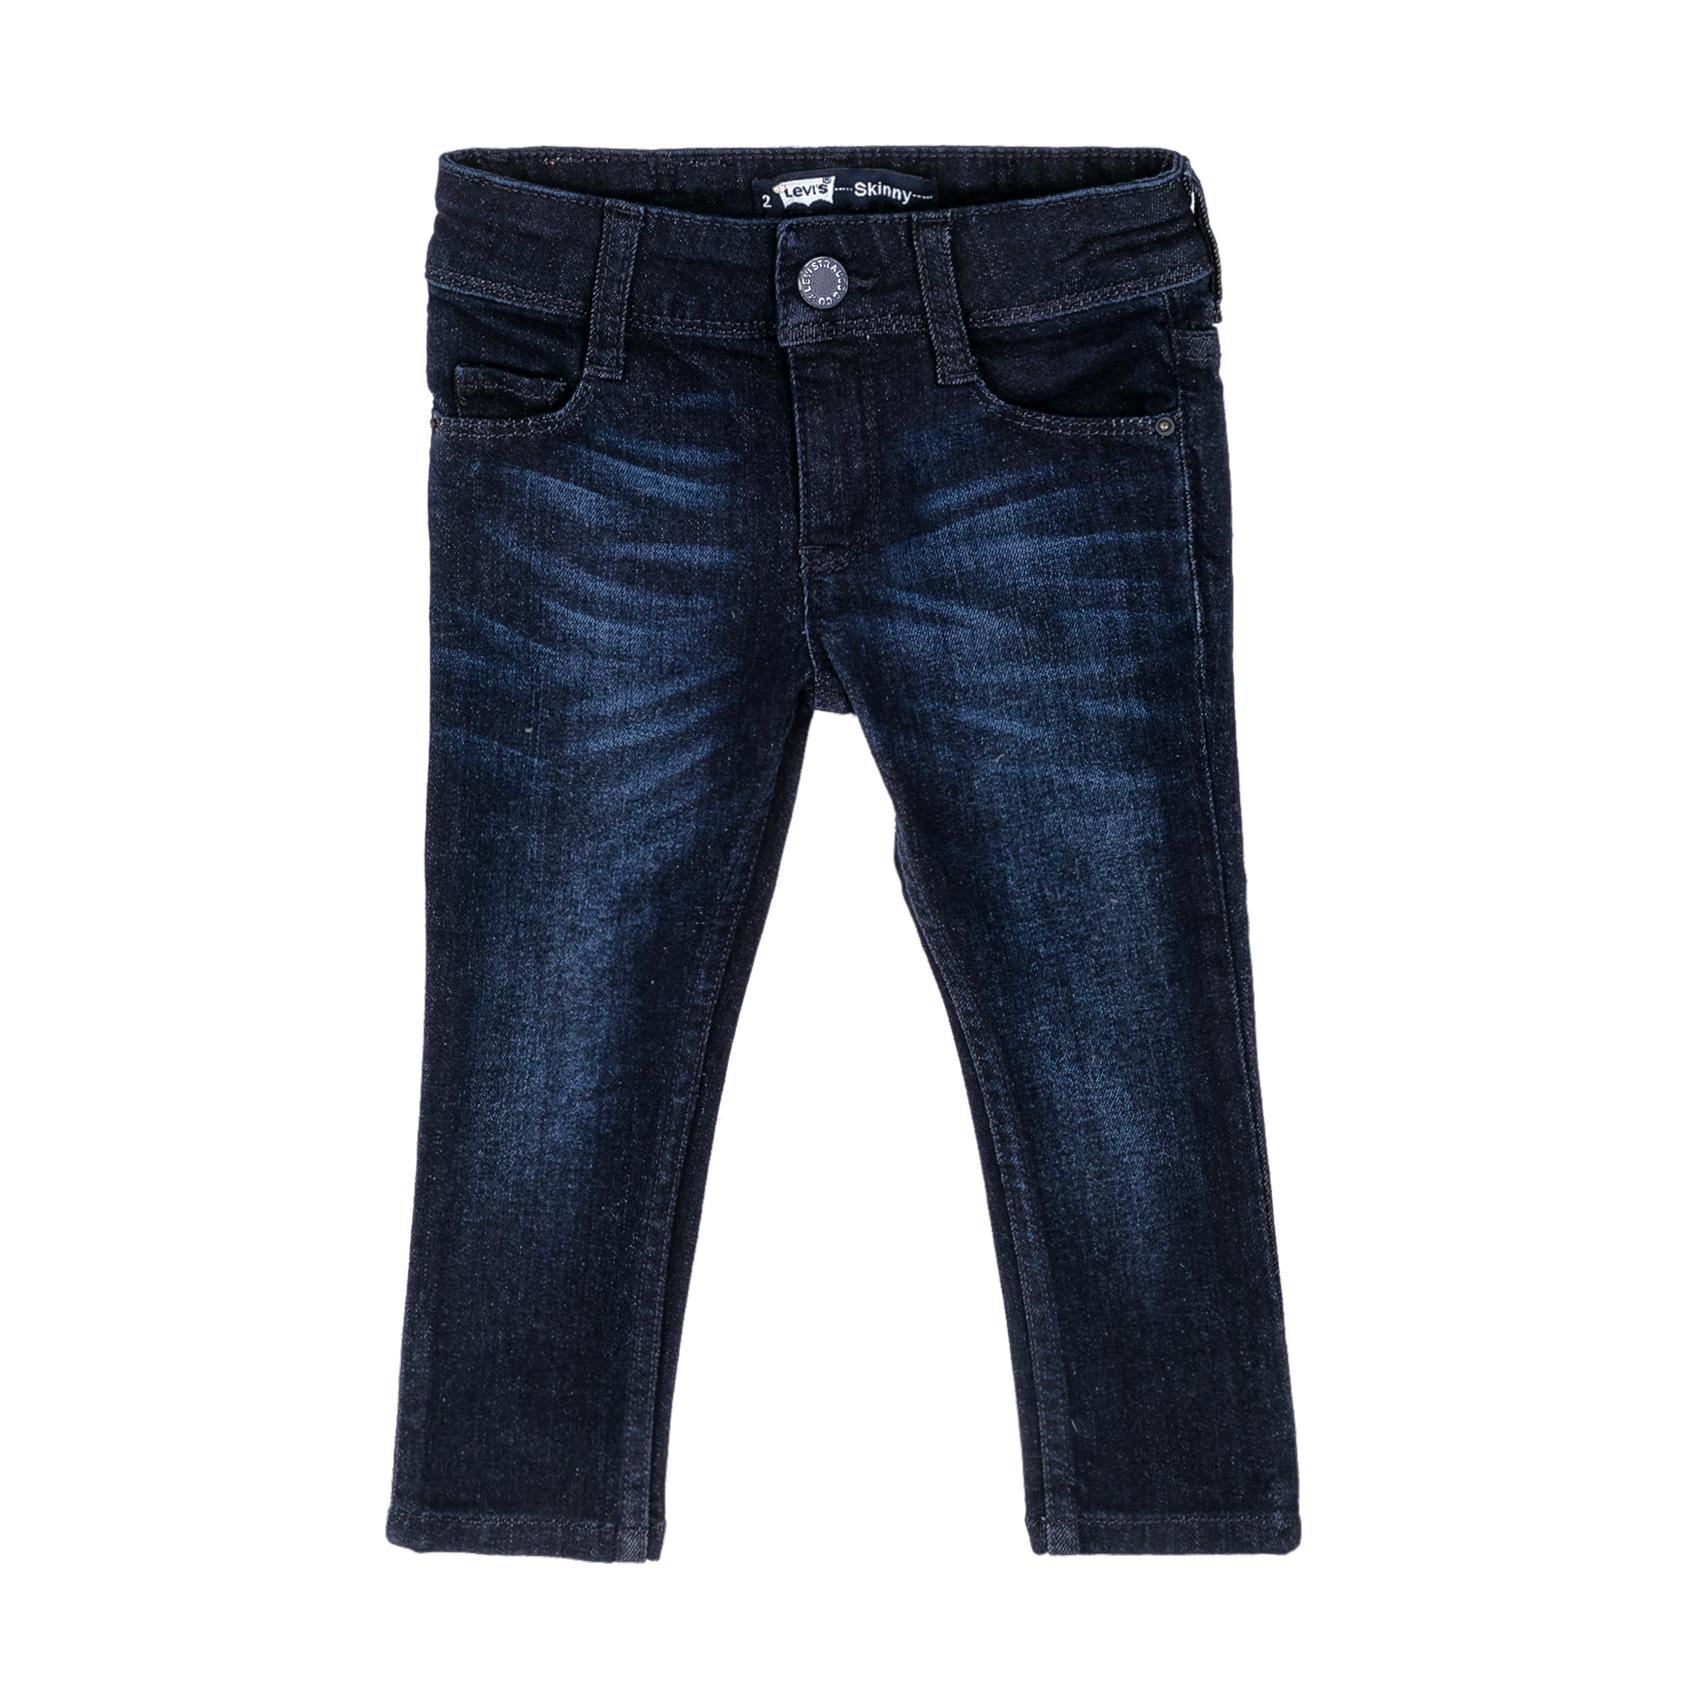 LEVI'S KIDS – Παιδικό τζιν παντελόνι LEVI'S KIDS μπλε